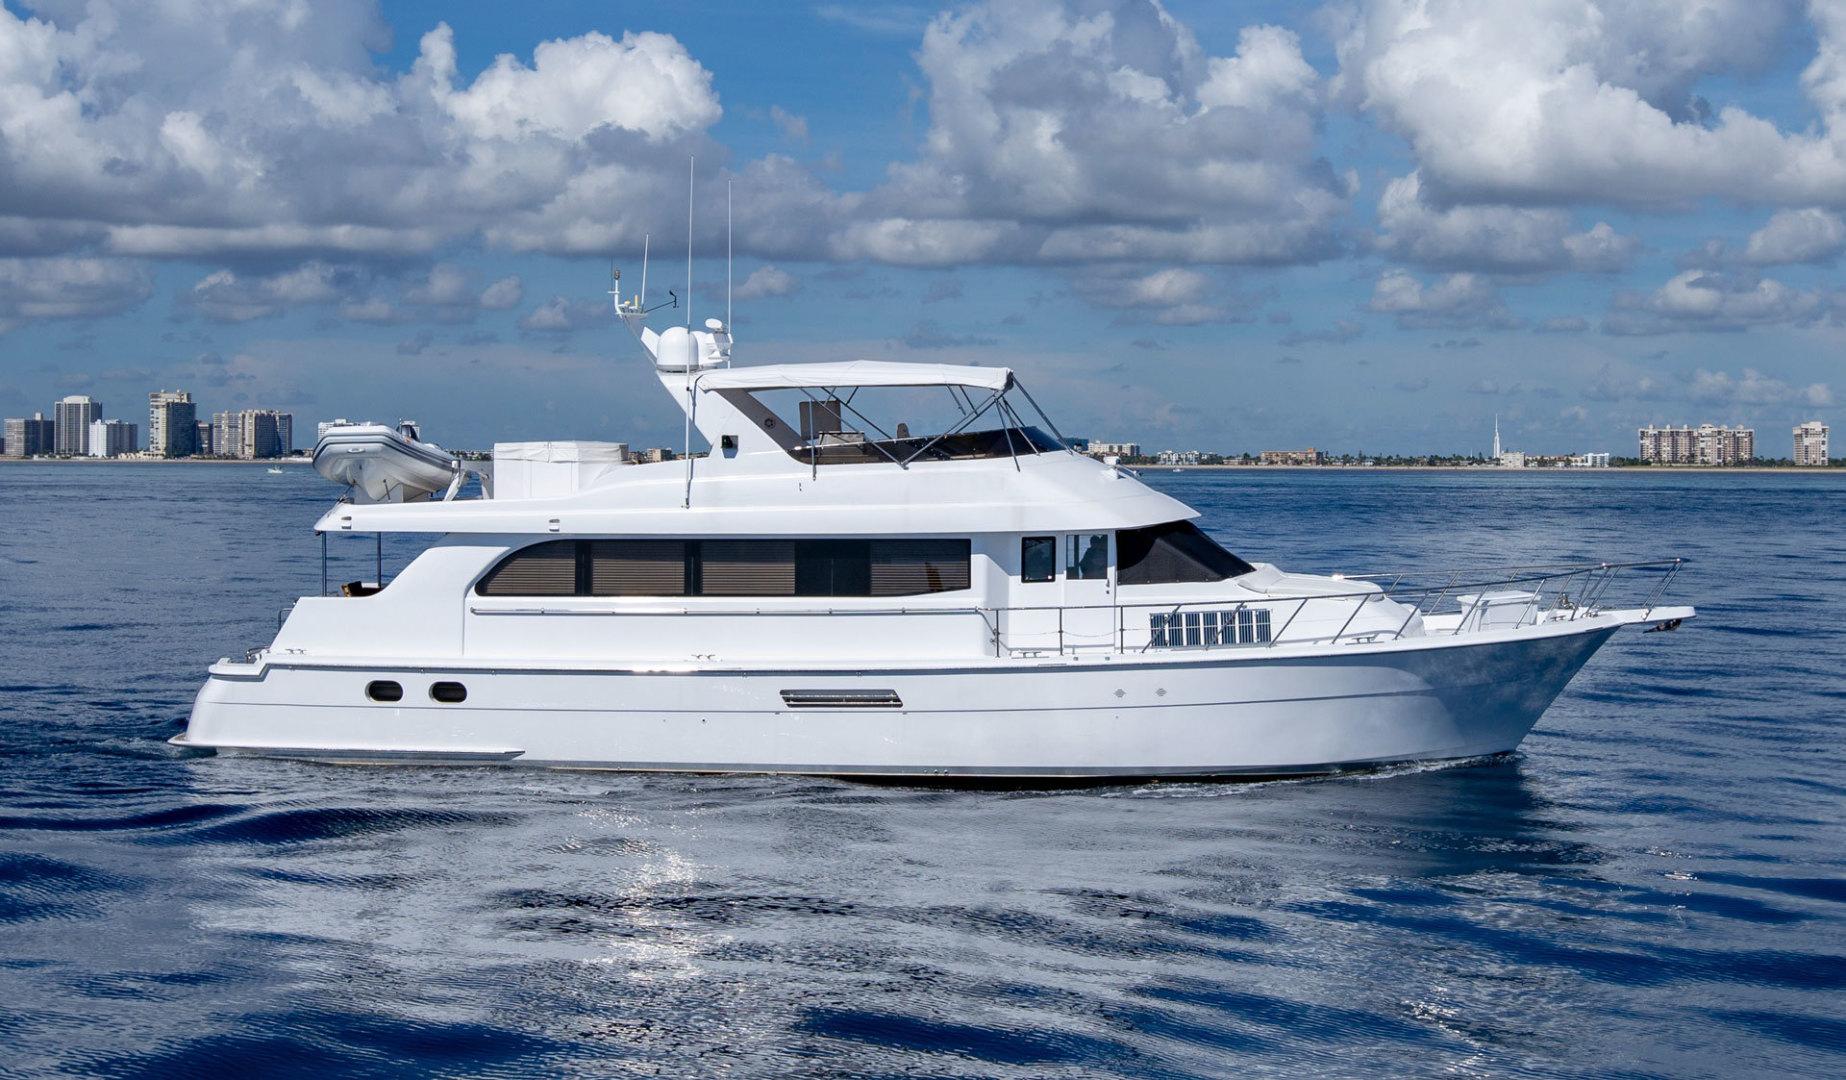 Hatteras-Cockpit Motor Yacht 2000-Getaway Ft. Lauderdale-Florida-United States-1417504 | Thumbnail